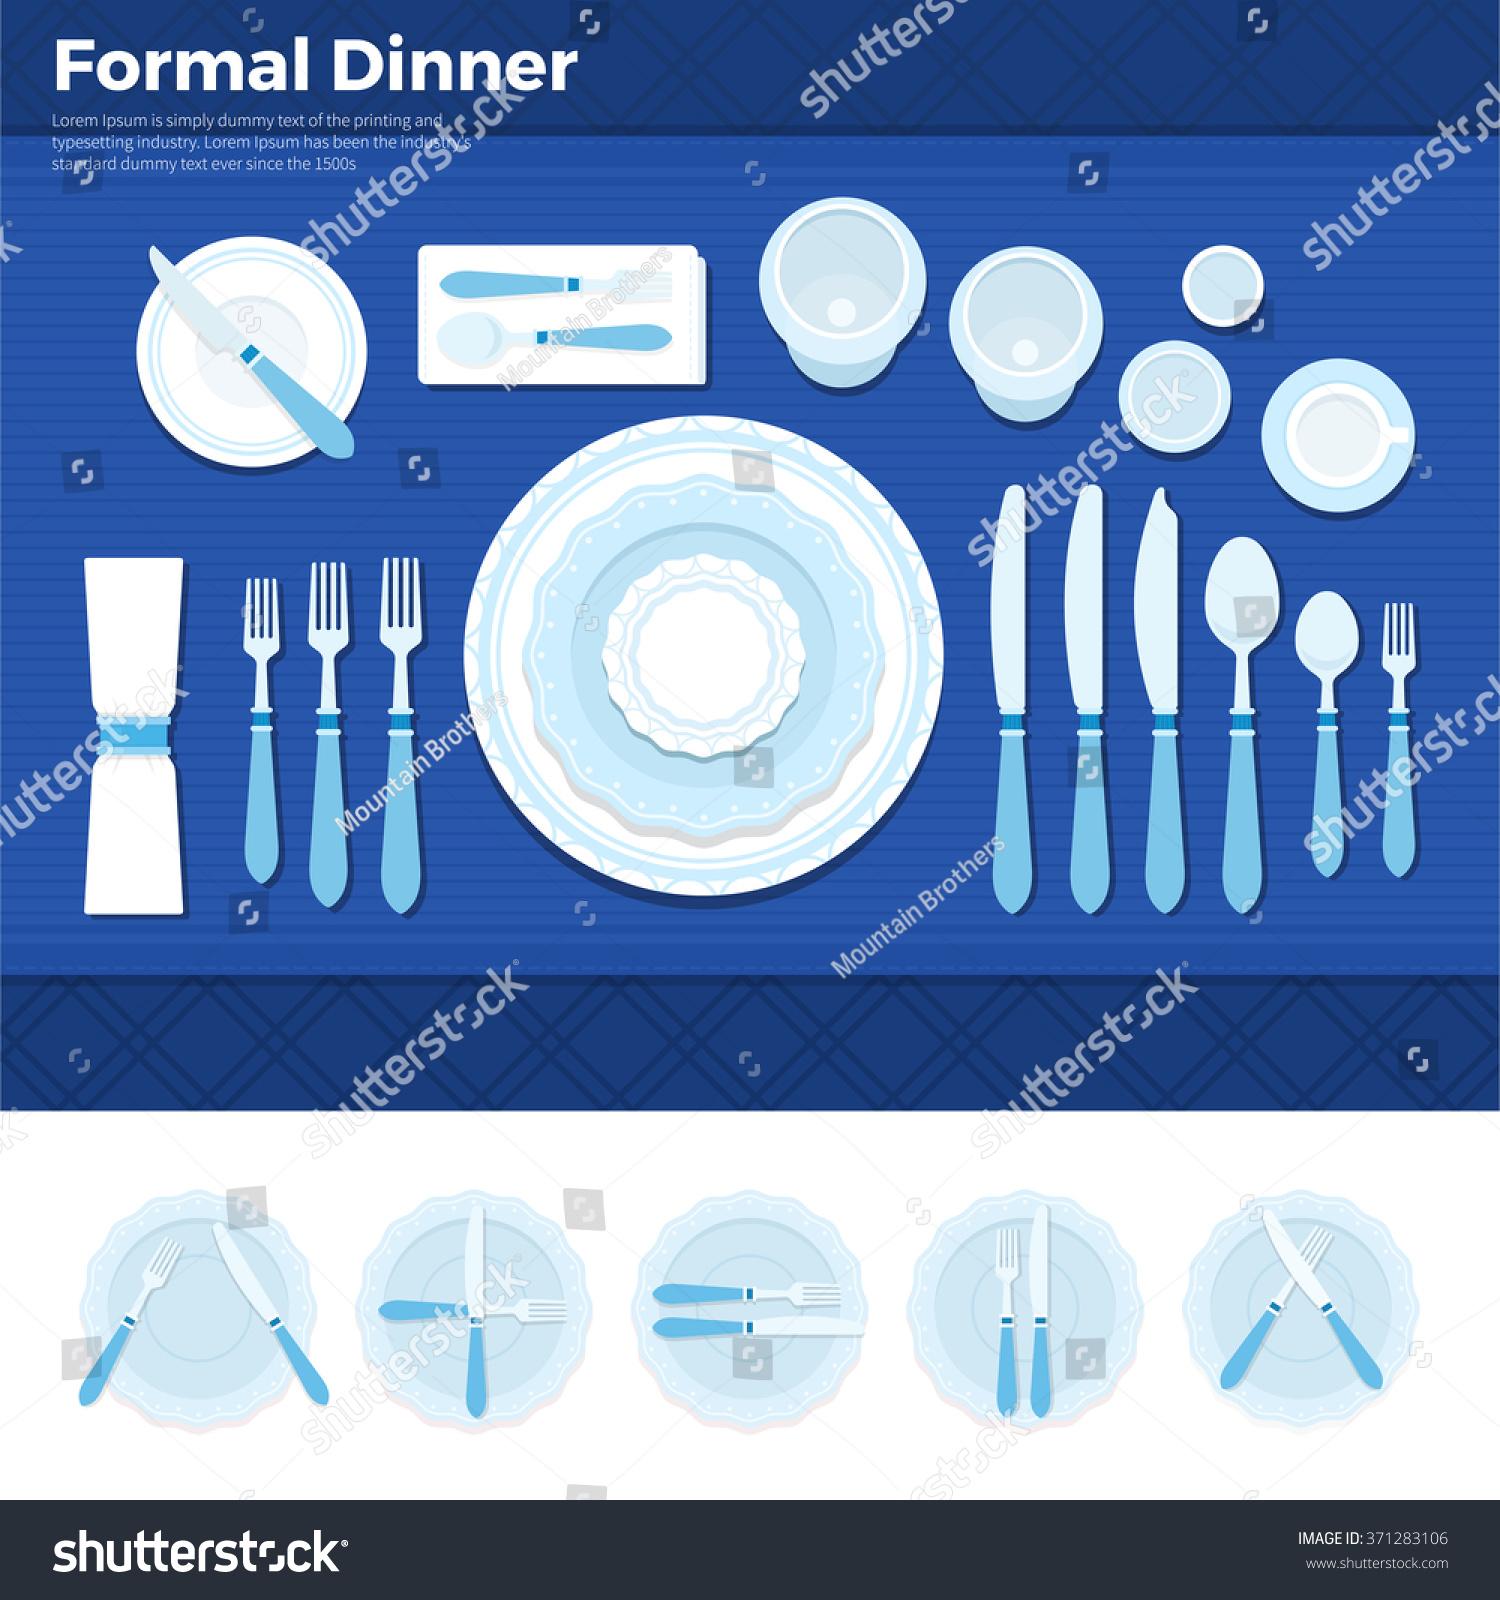 Formal dinner vector flat illustrations. Table served with utensils for formal dinner plate with  sc 1 st  Shutterstock & Formal Dinner Vector Flat Illustrations Table Stock Vector (2018 ...